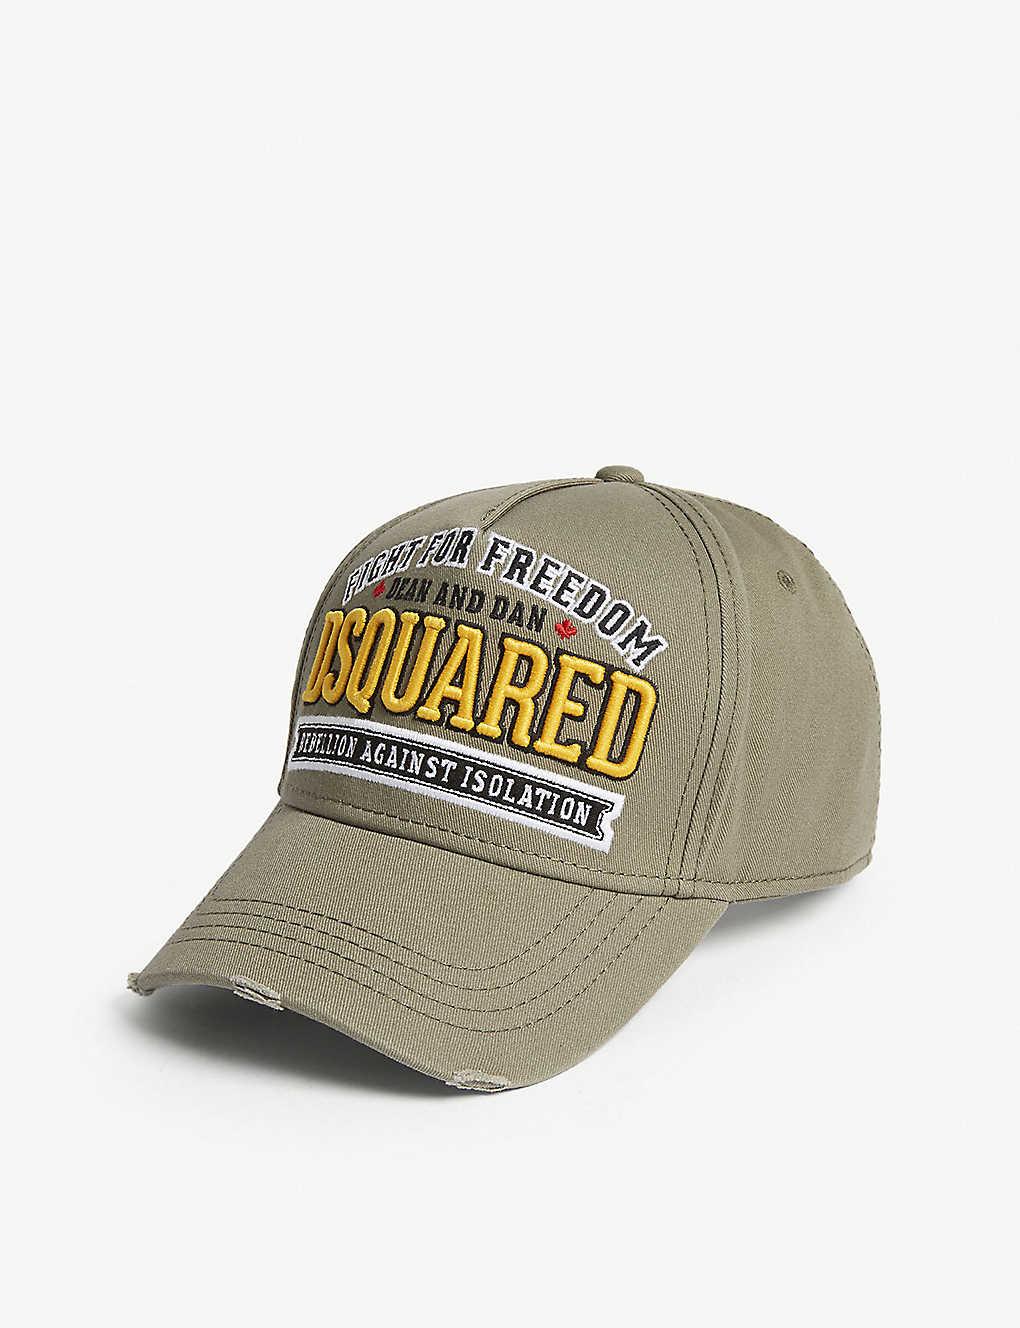 4324286a91df5a DSQUARED2 - Freedom cotton strapback cap   Selfridges.com